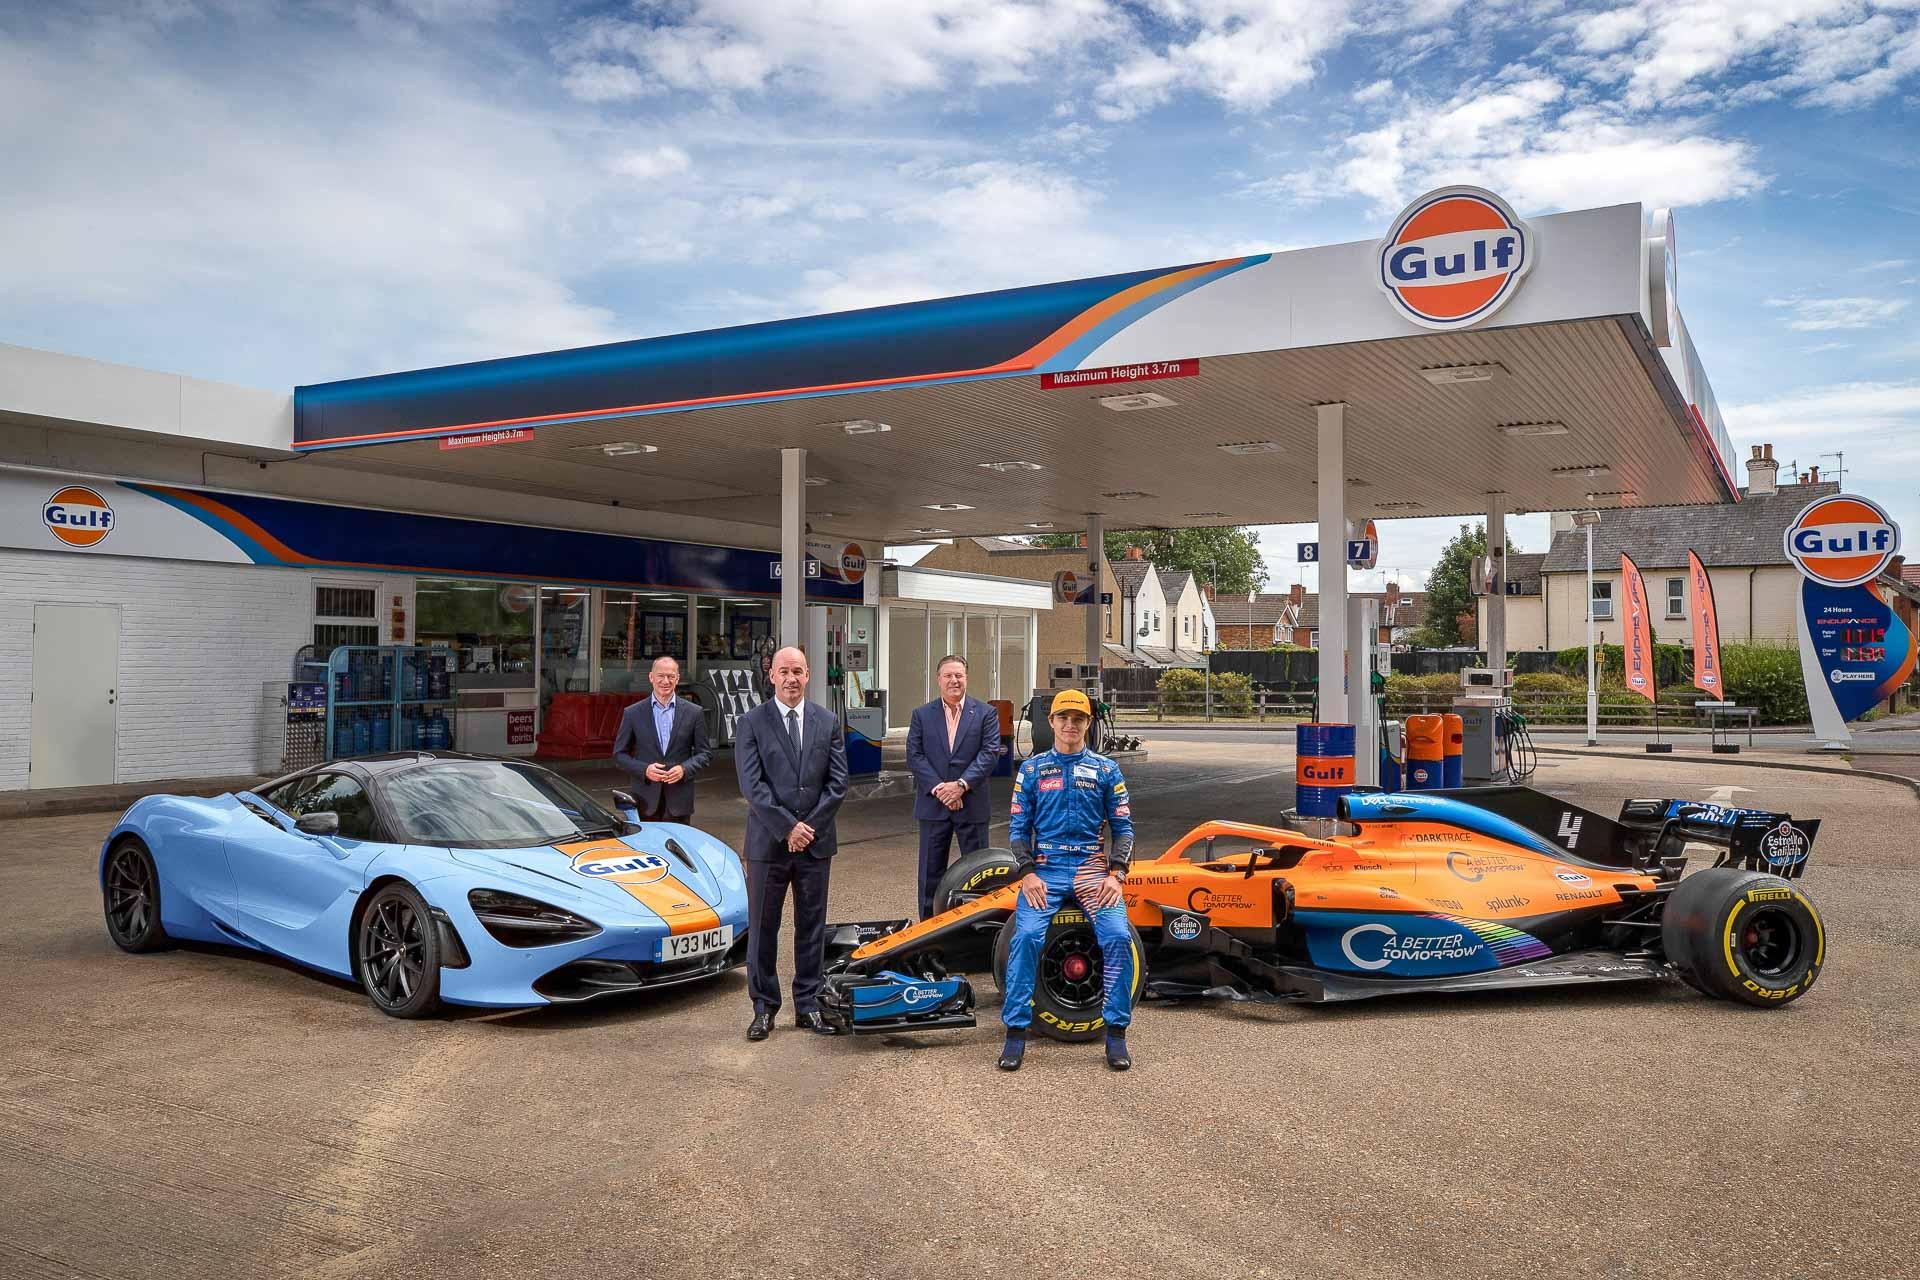 2020 McLaren Gulf   Fanaticar Magazin